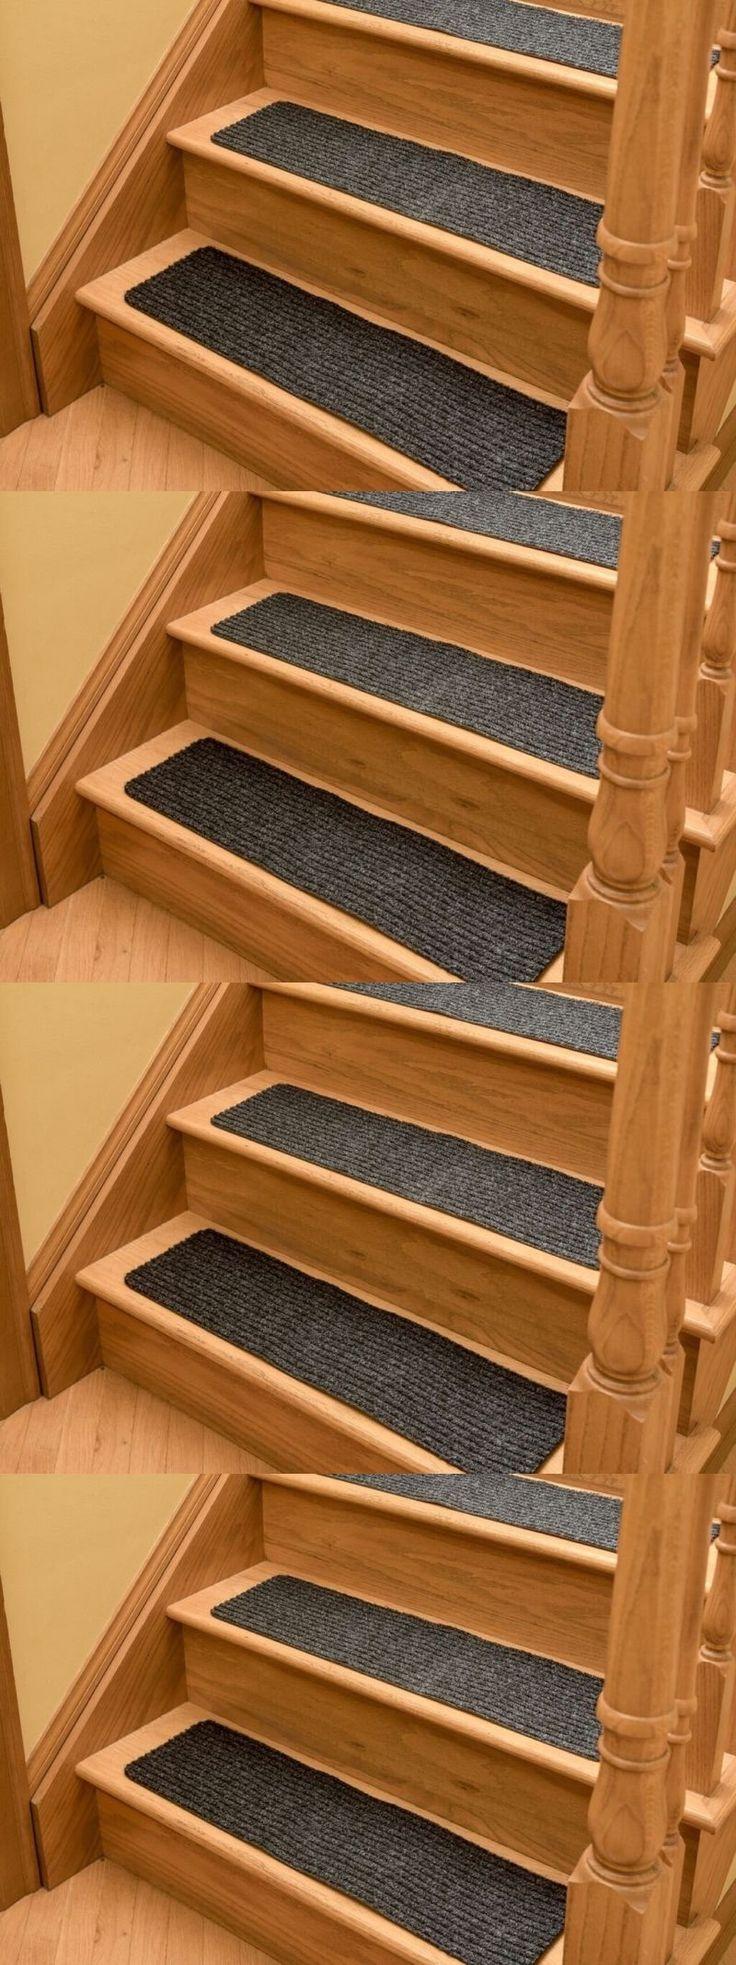 Top 25 Best Carpet Stair Treads Ideas On Pinterest Wood Stair With Premium  Carpet Stair Treads